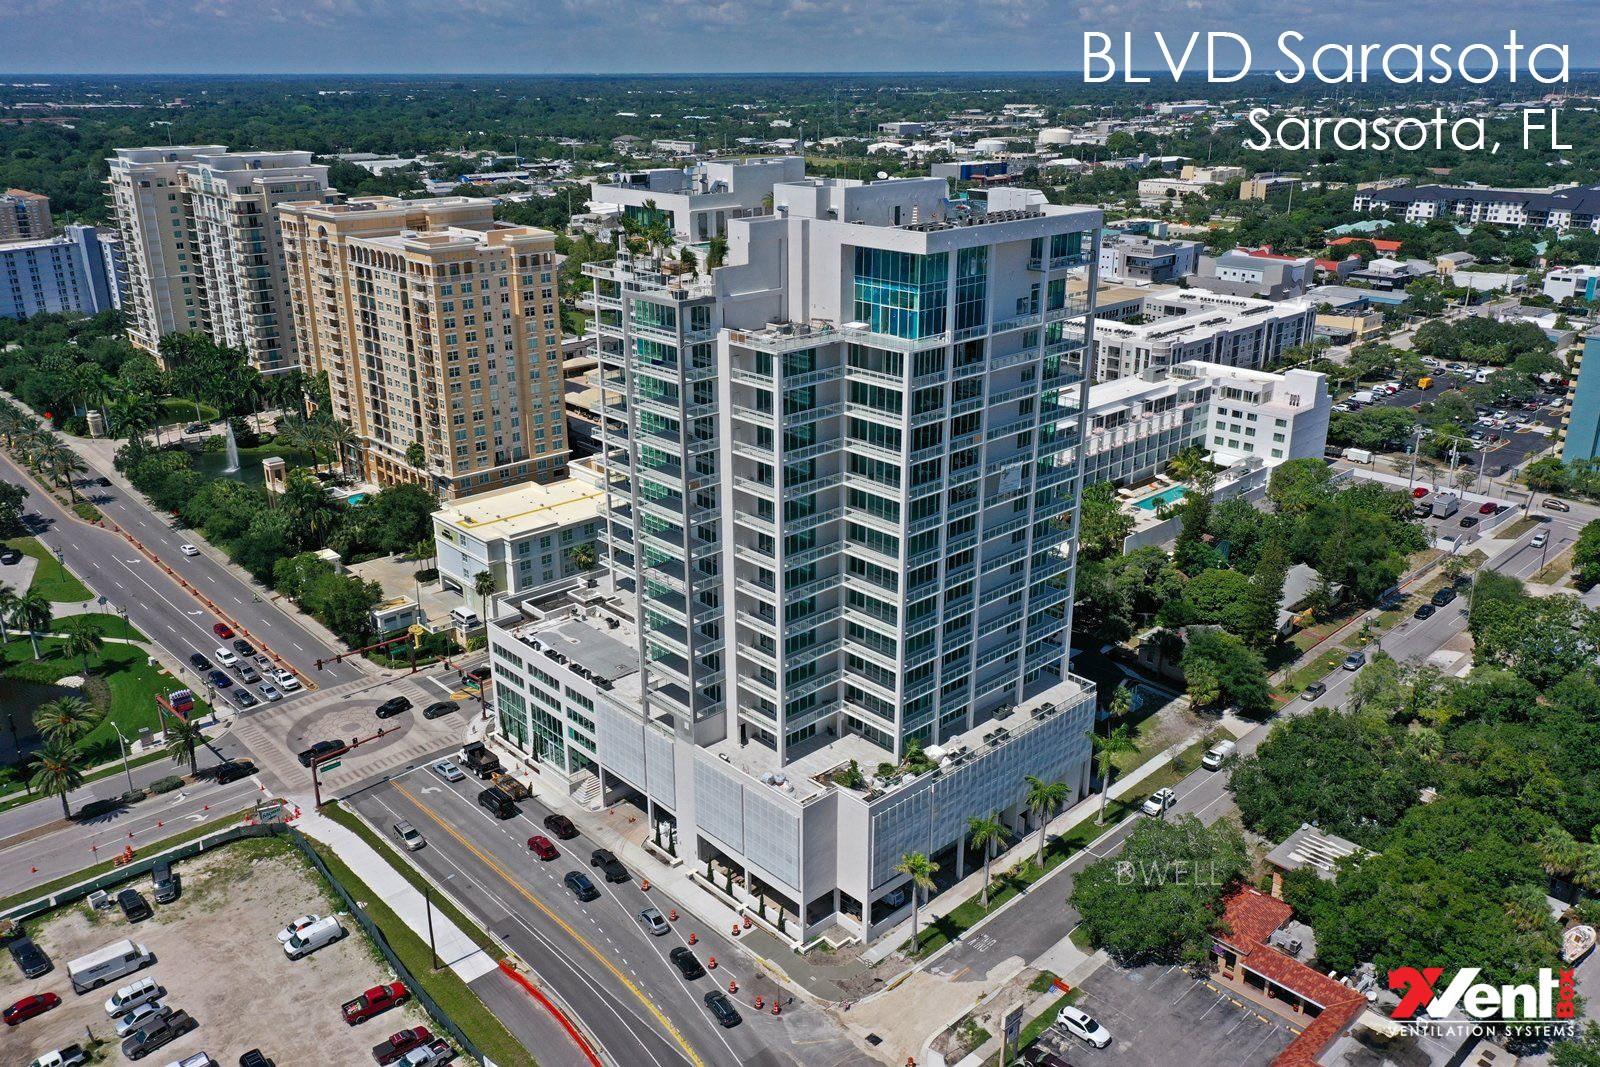 BLVD Sarasota